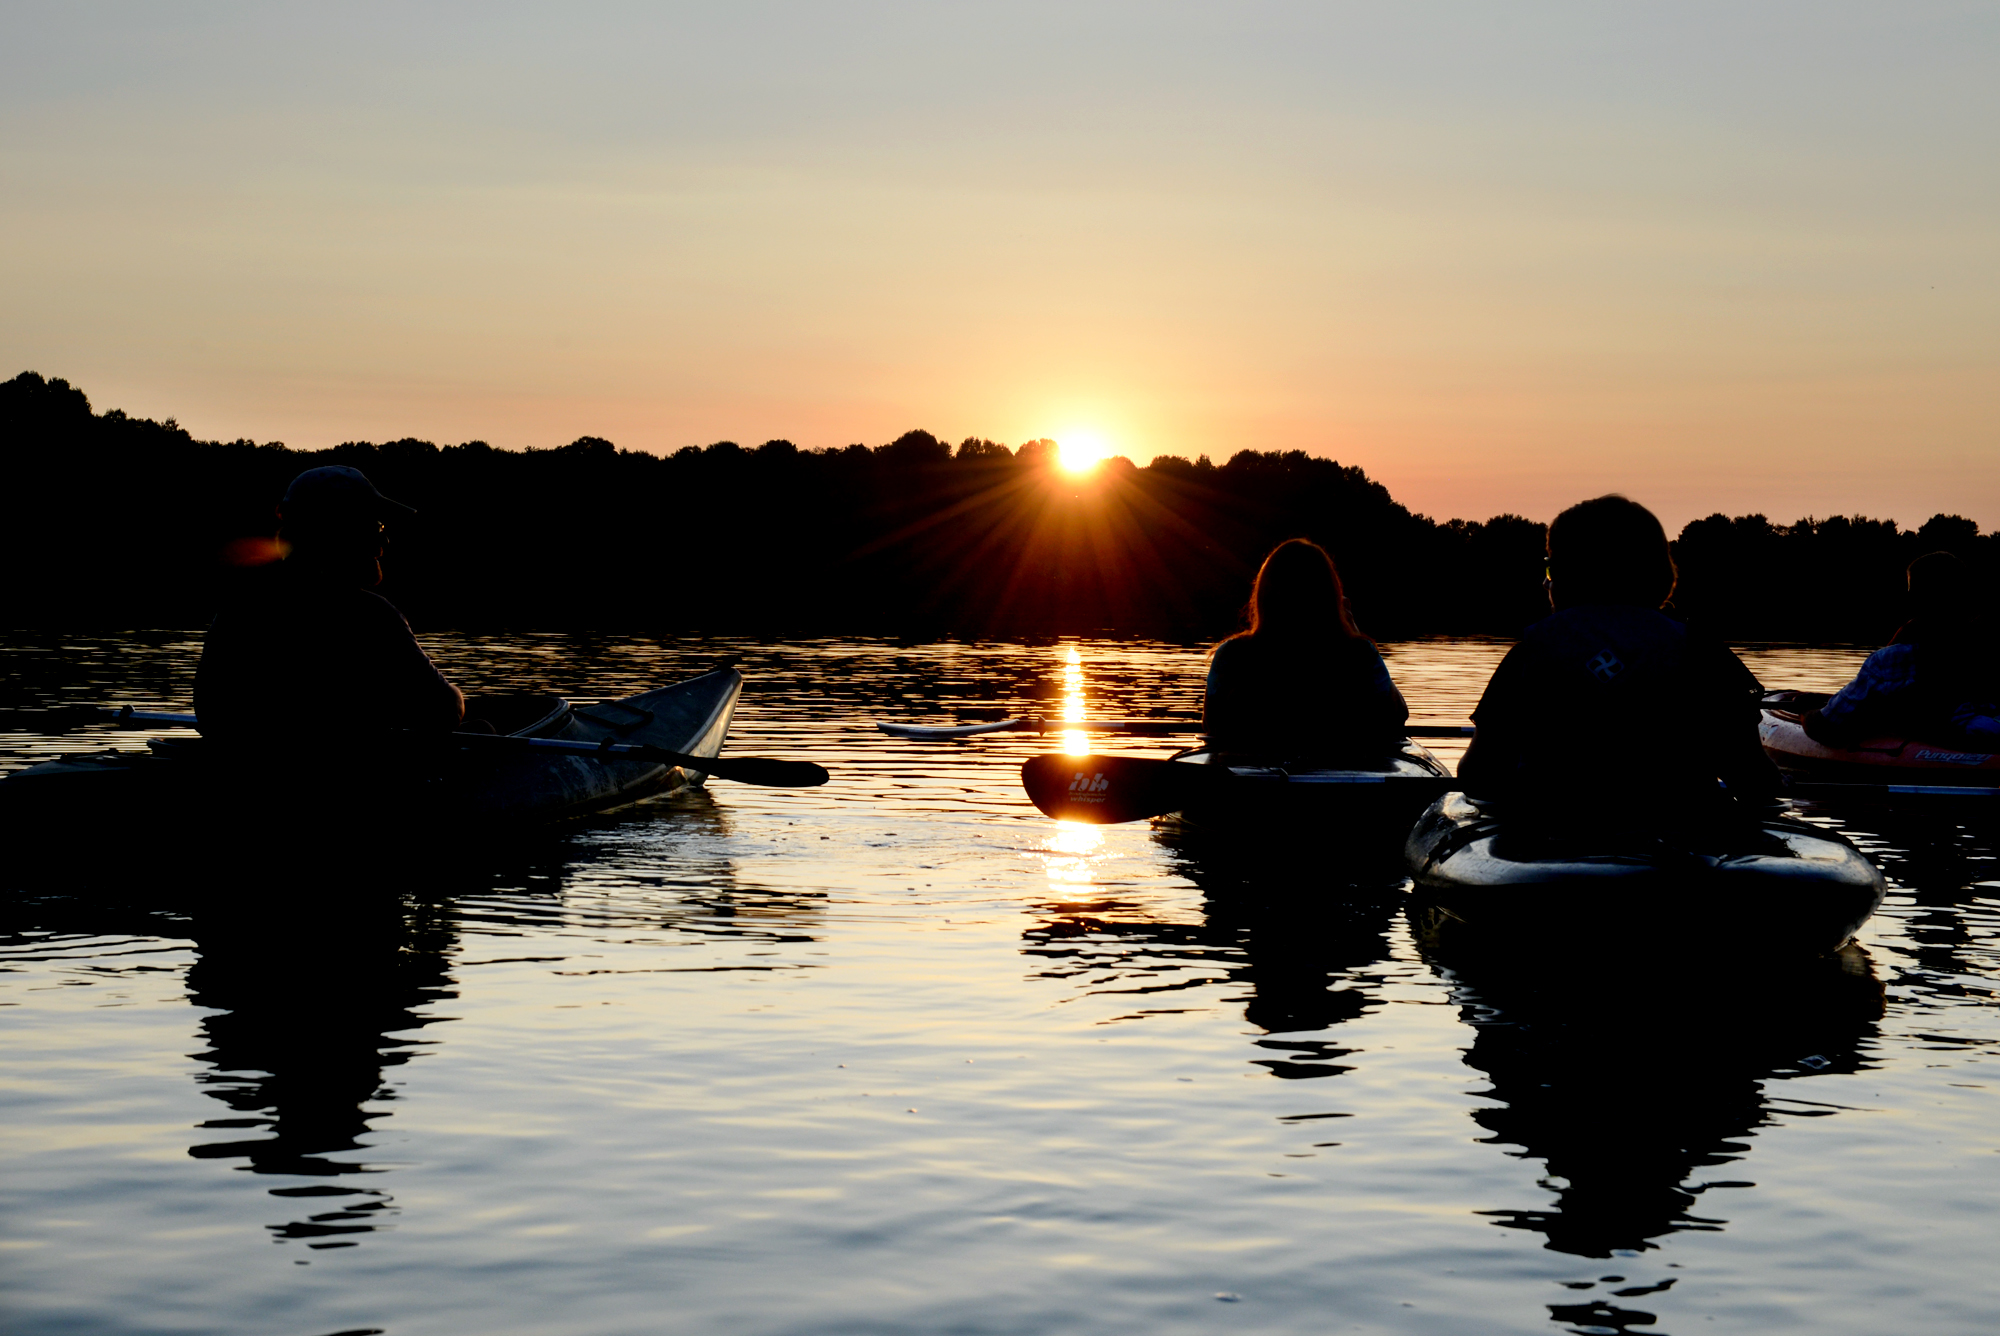 Taking a sunset kayak tour of Piney Run Reservoir